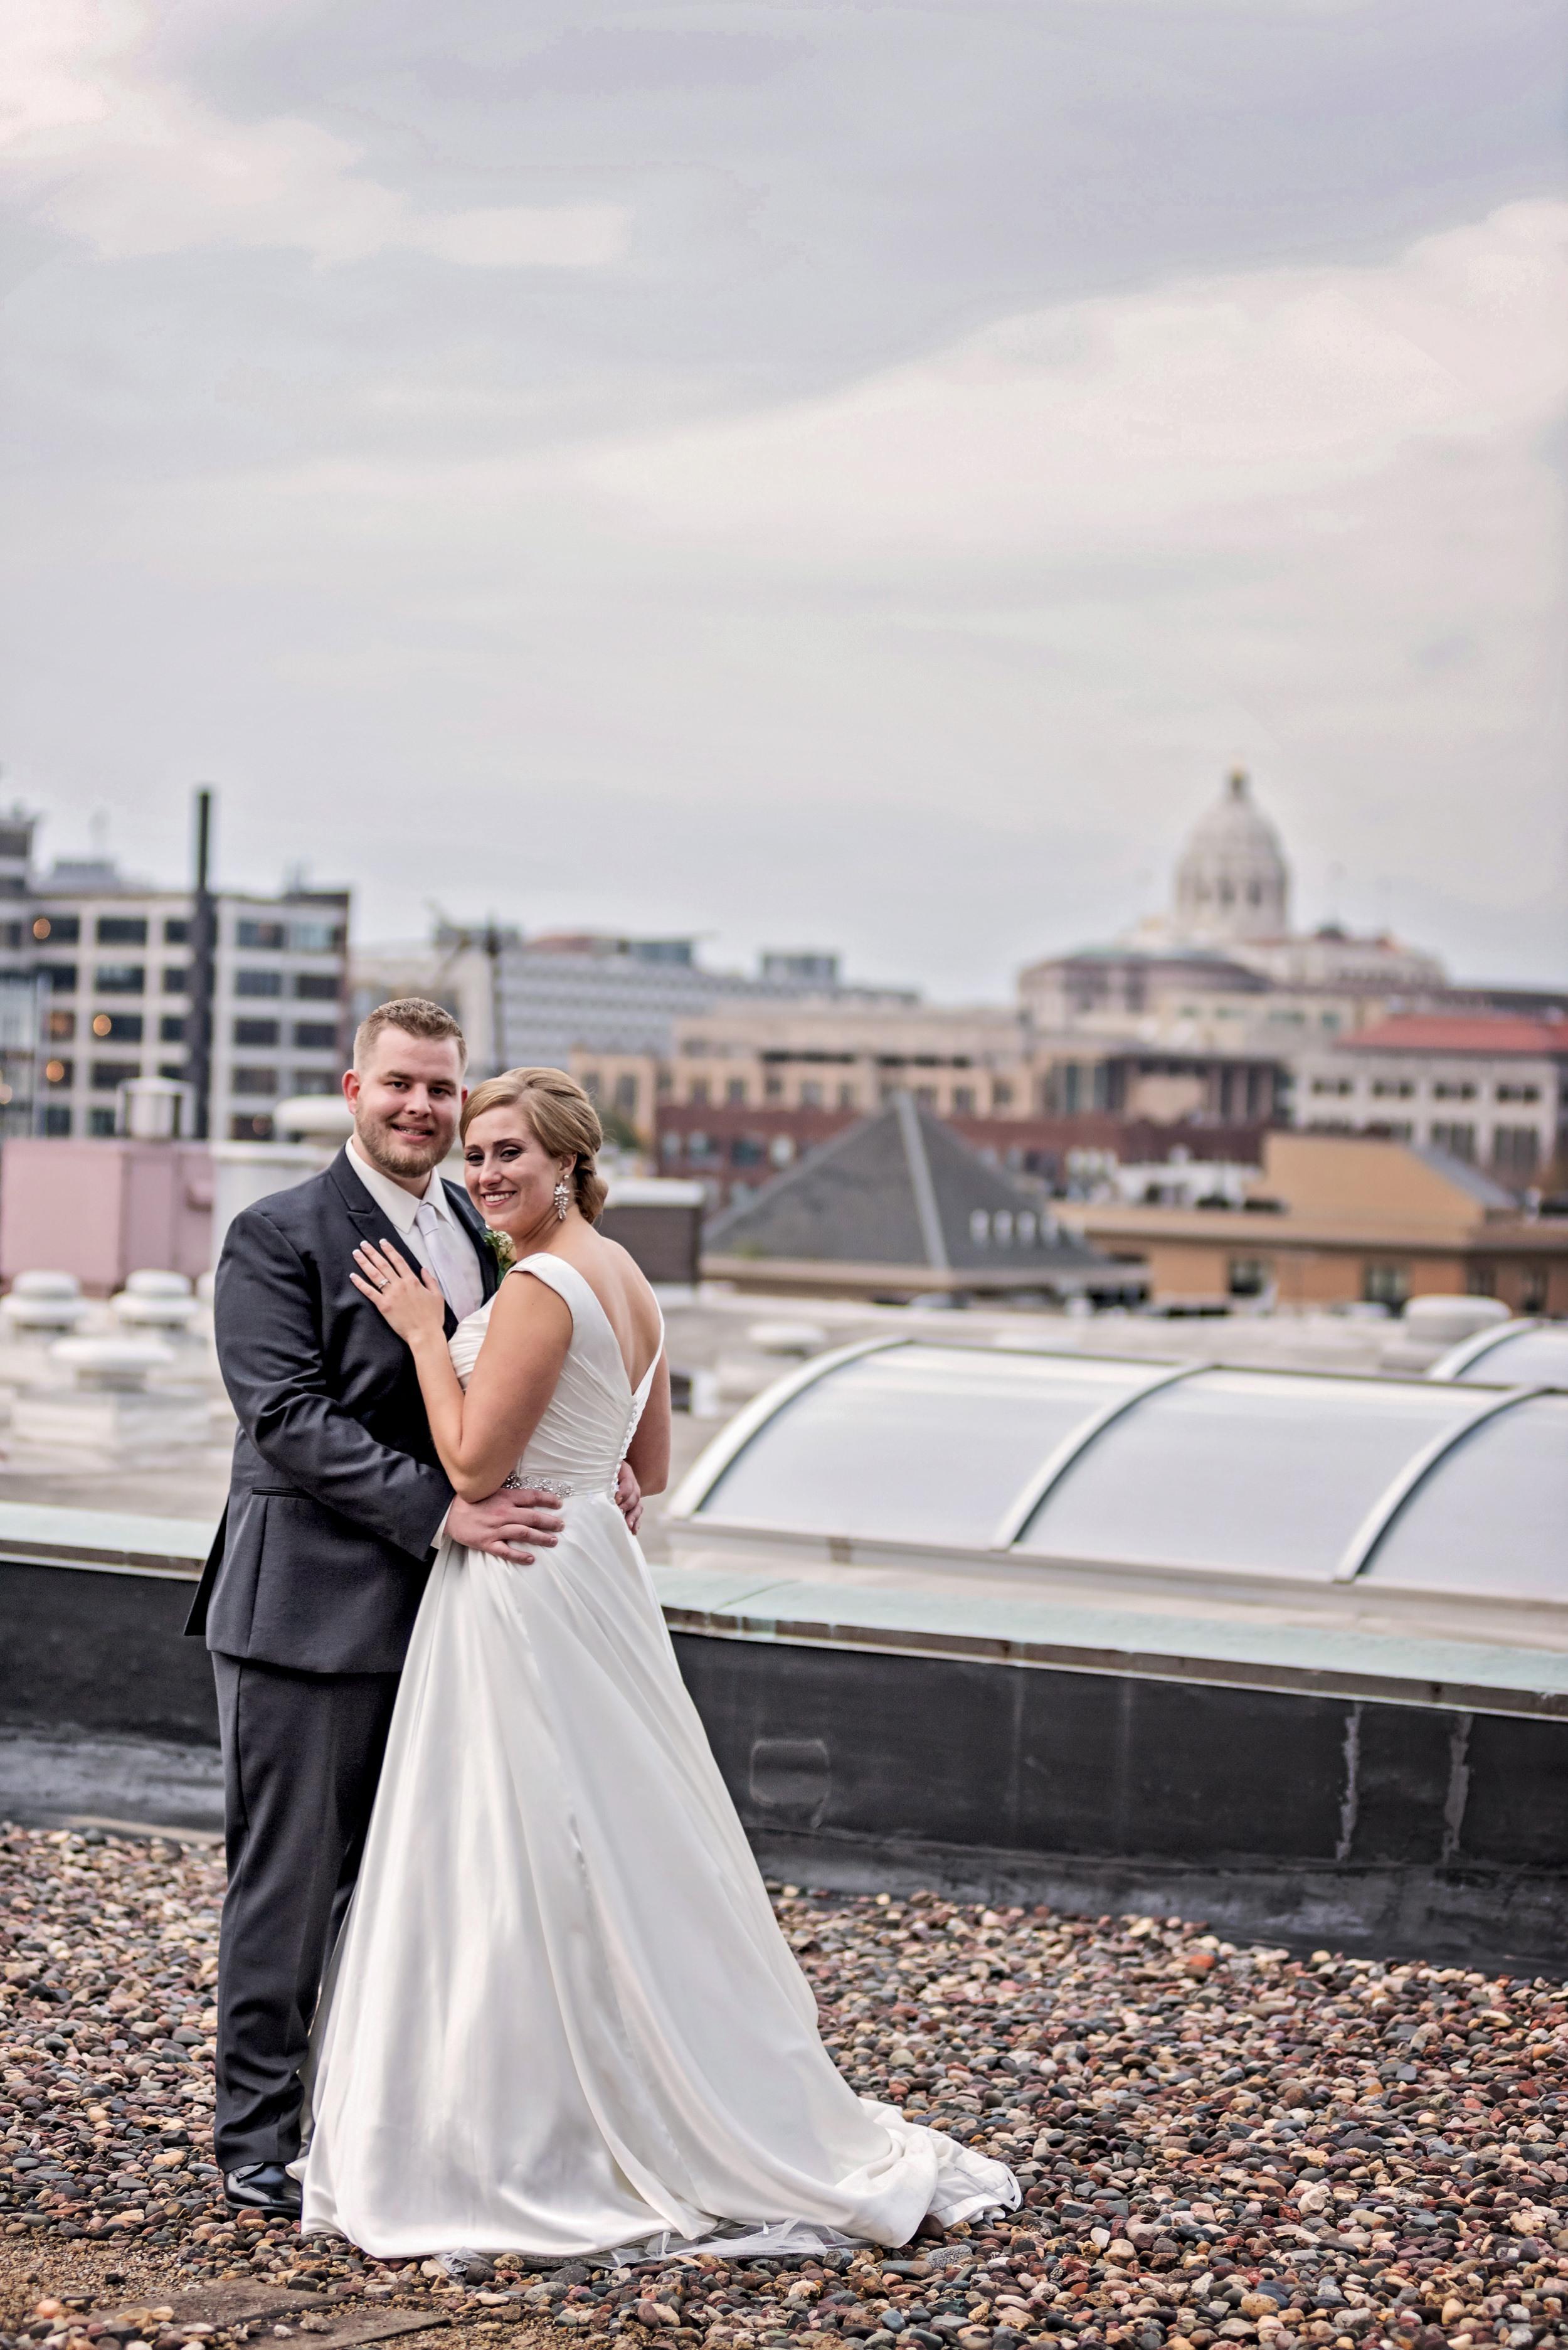 2018-Real-Wedding-Megan-Brenden-Rotella-Photography_0497.jpg